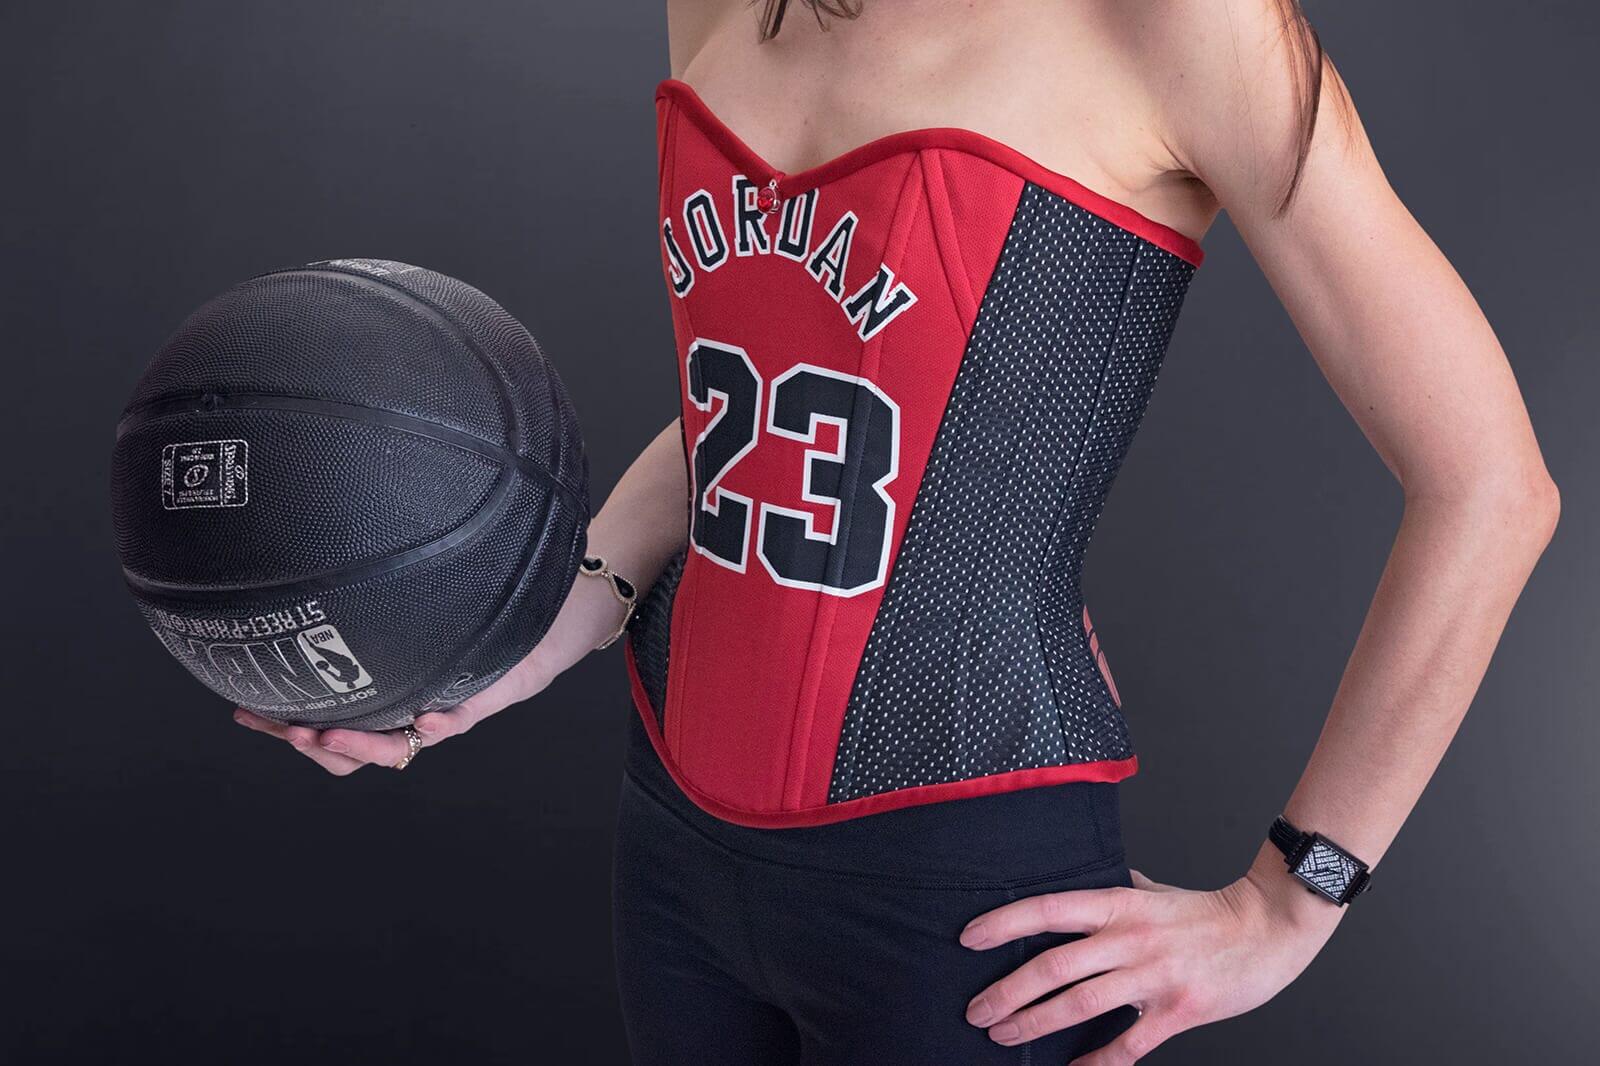 Stella holding basketball wearing her Chicago Bulls Michael Jordan Corset #23 on black background